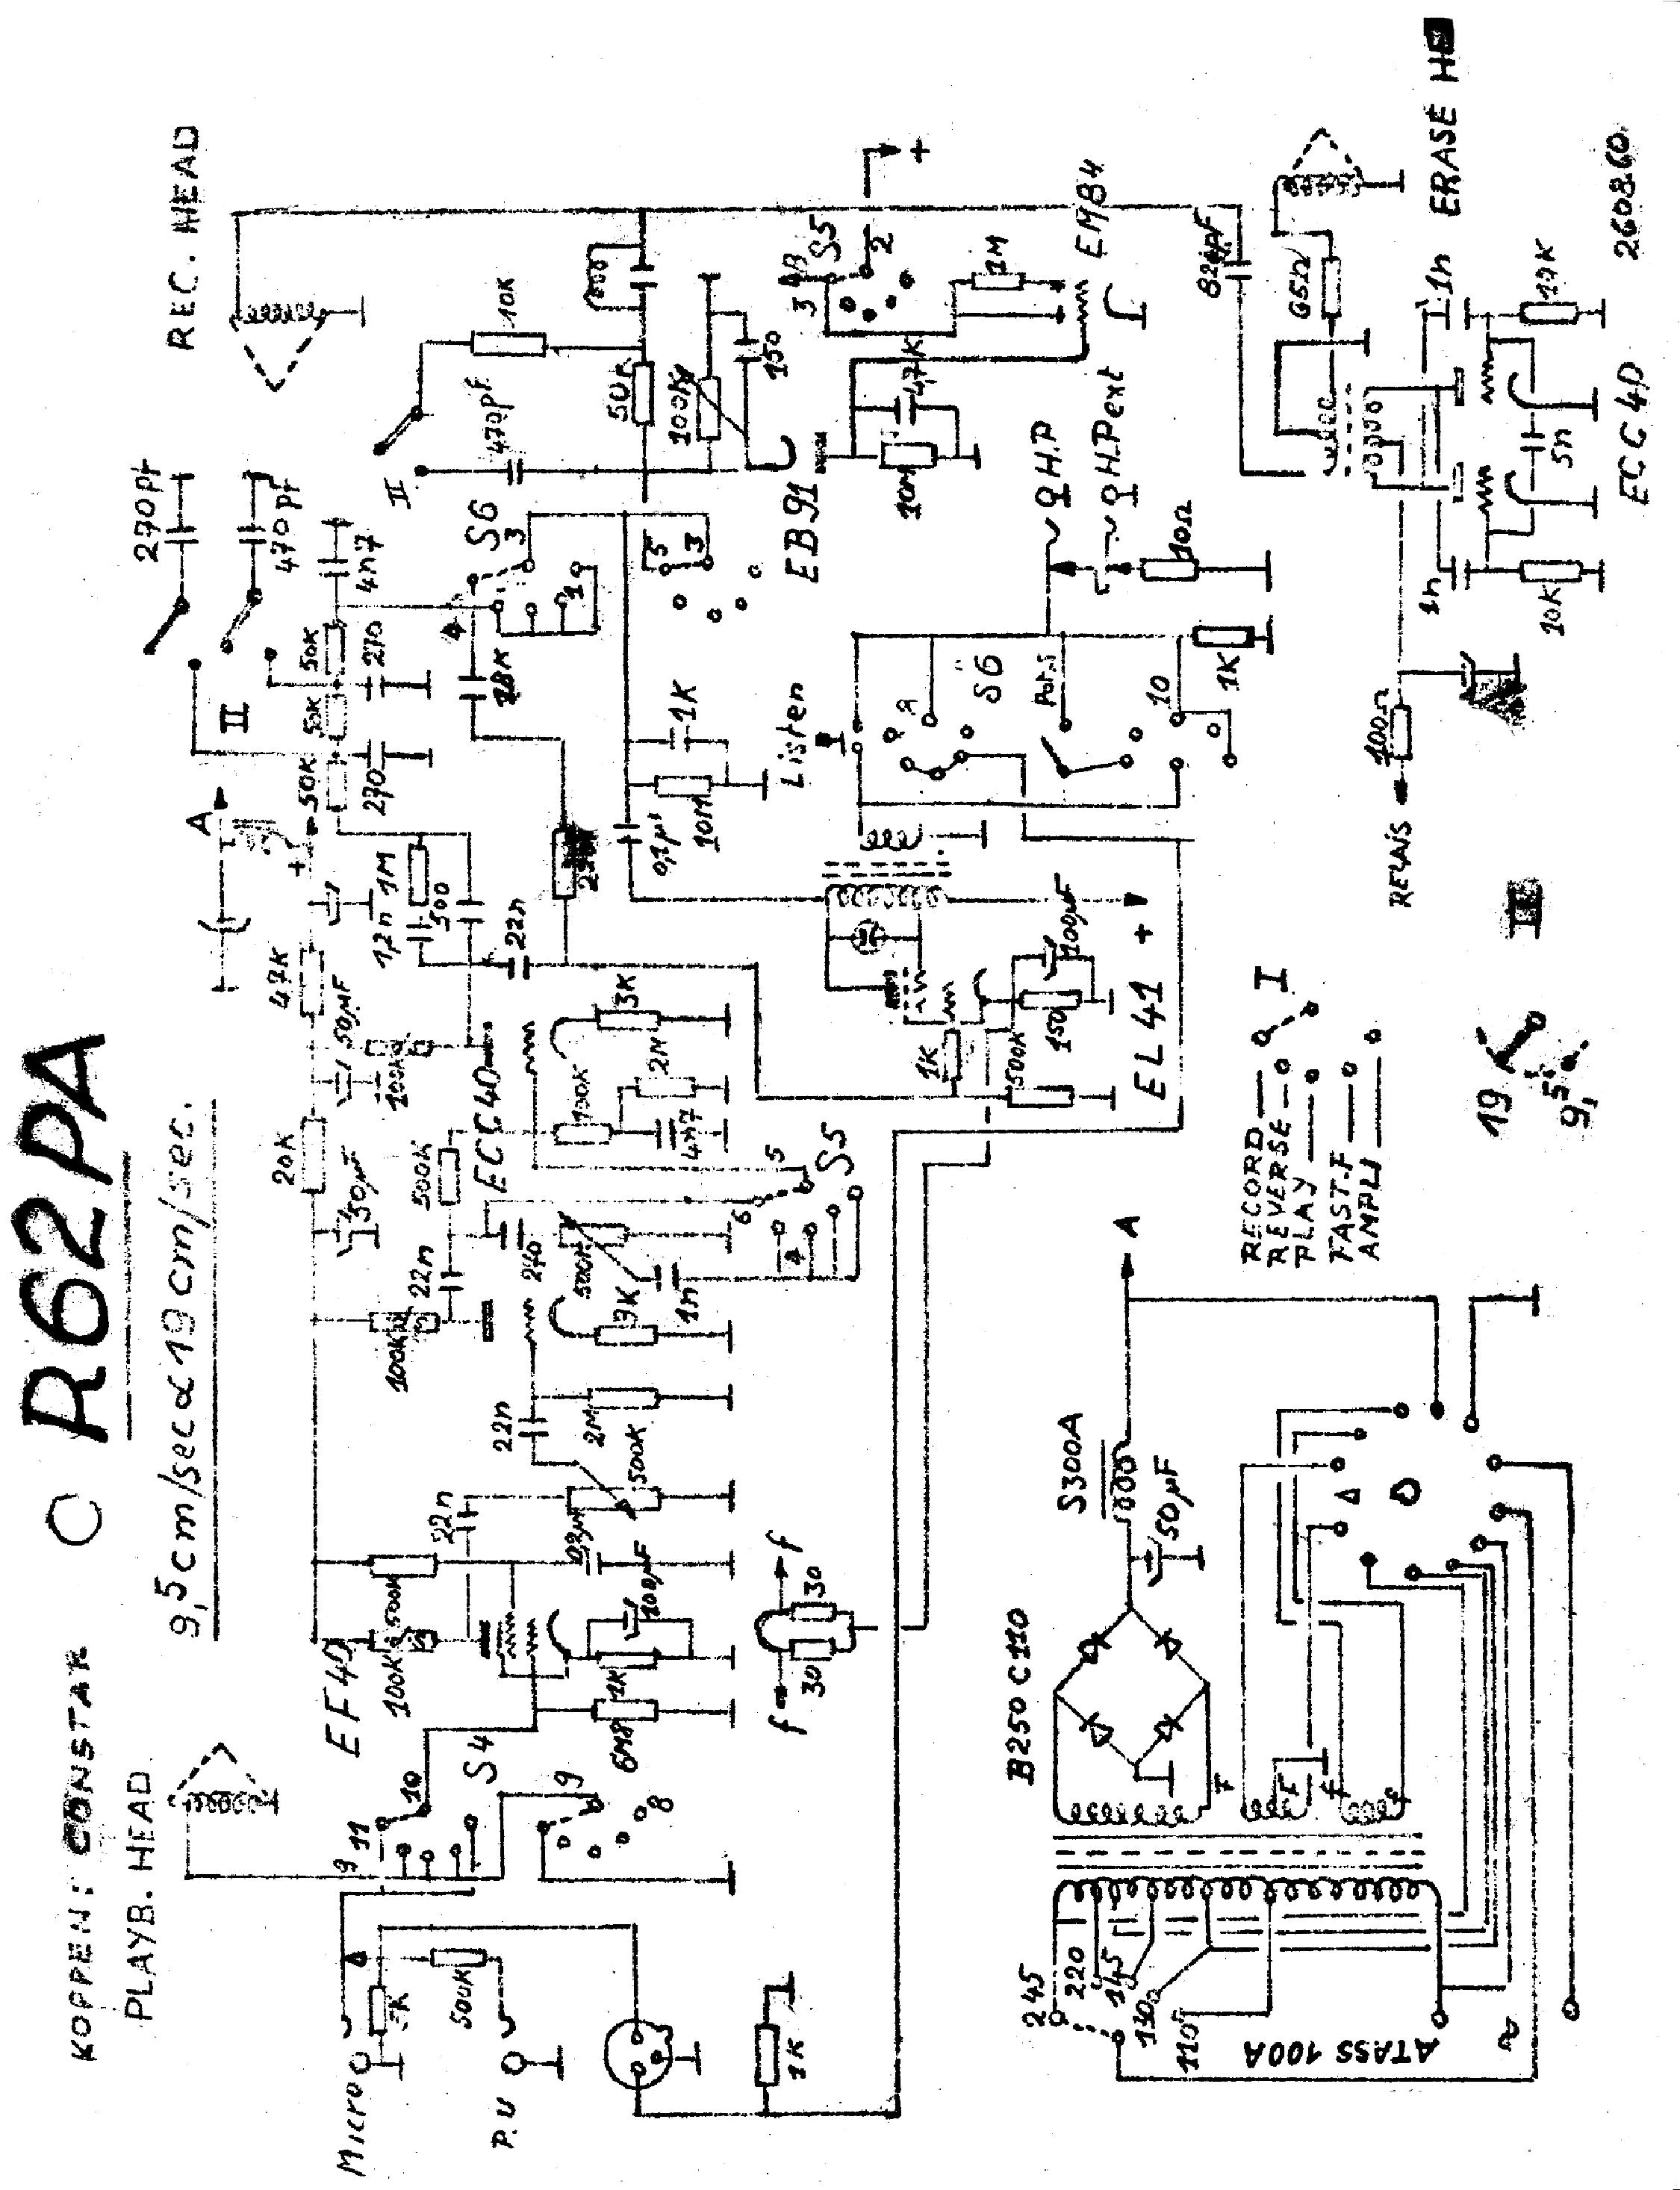 carad pptr33 b oc70 oc71 transistor stereo pre amplifier 1960 sch service manual download